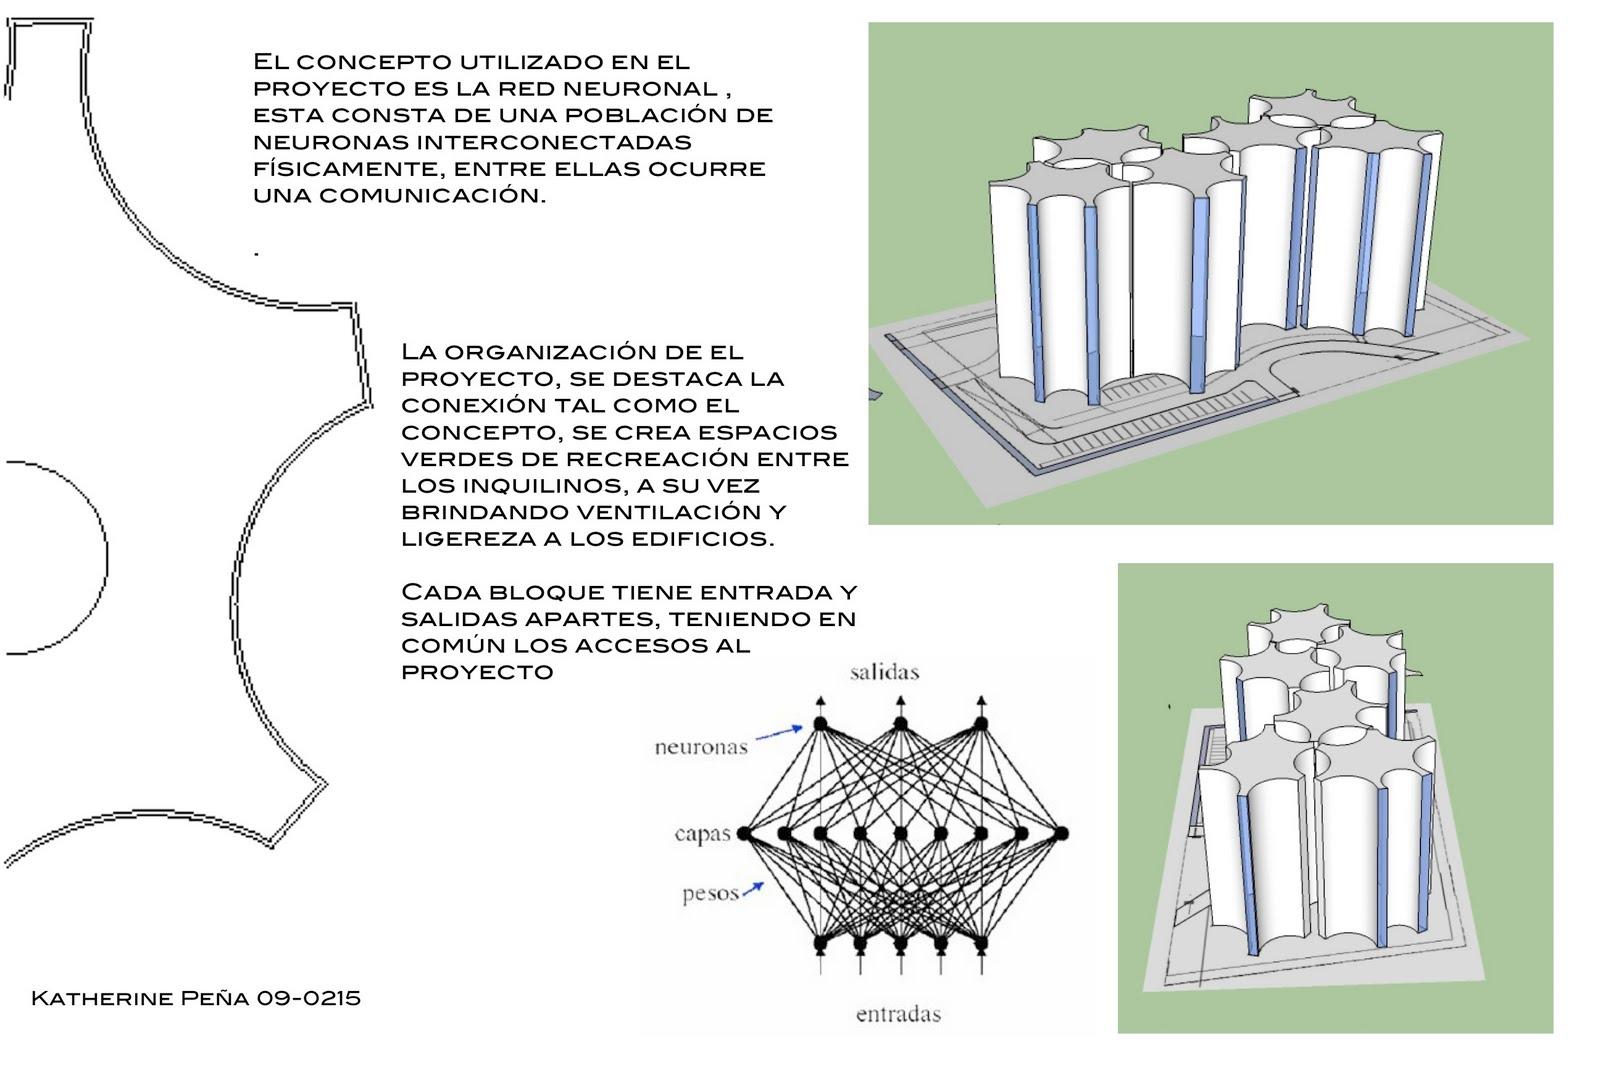 Dise o arquitect nico vi magaly caba 2010 for El concepto de arquitectura